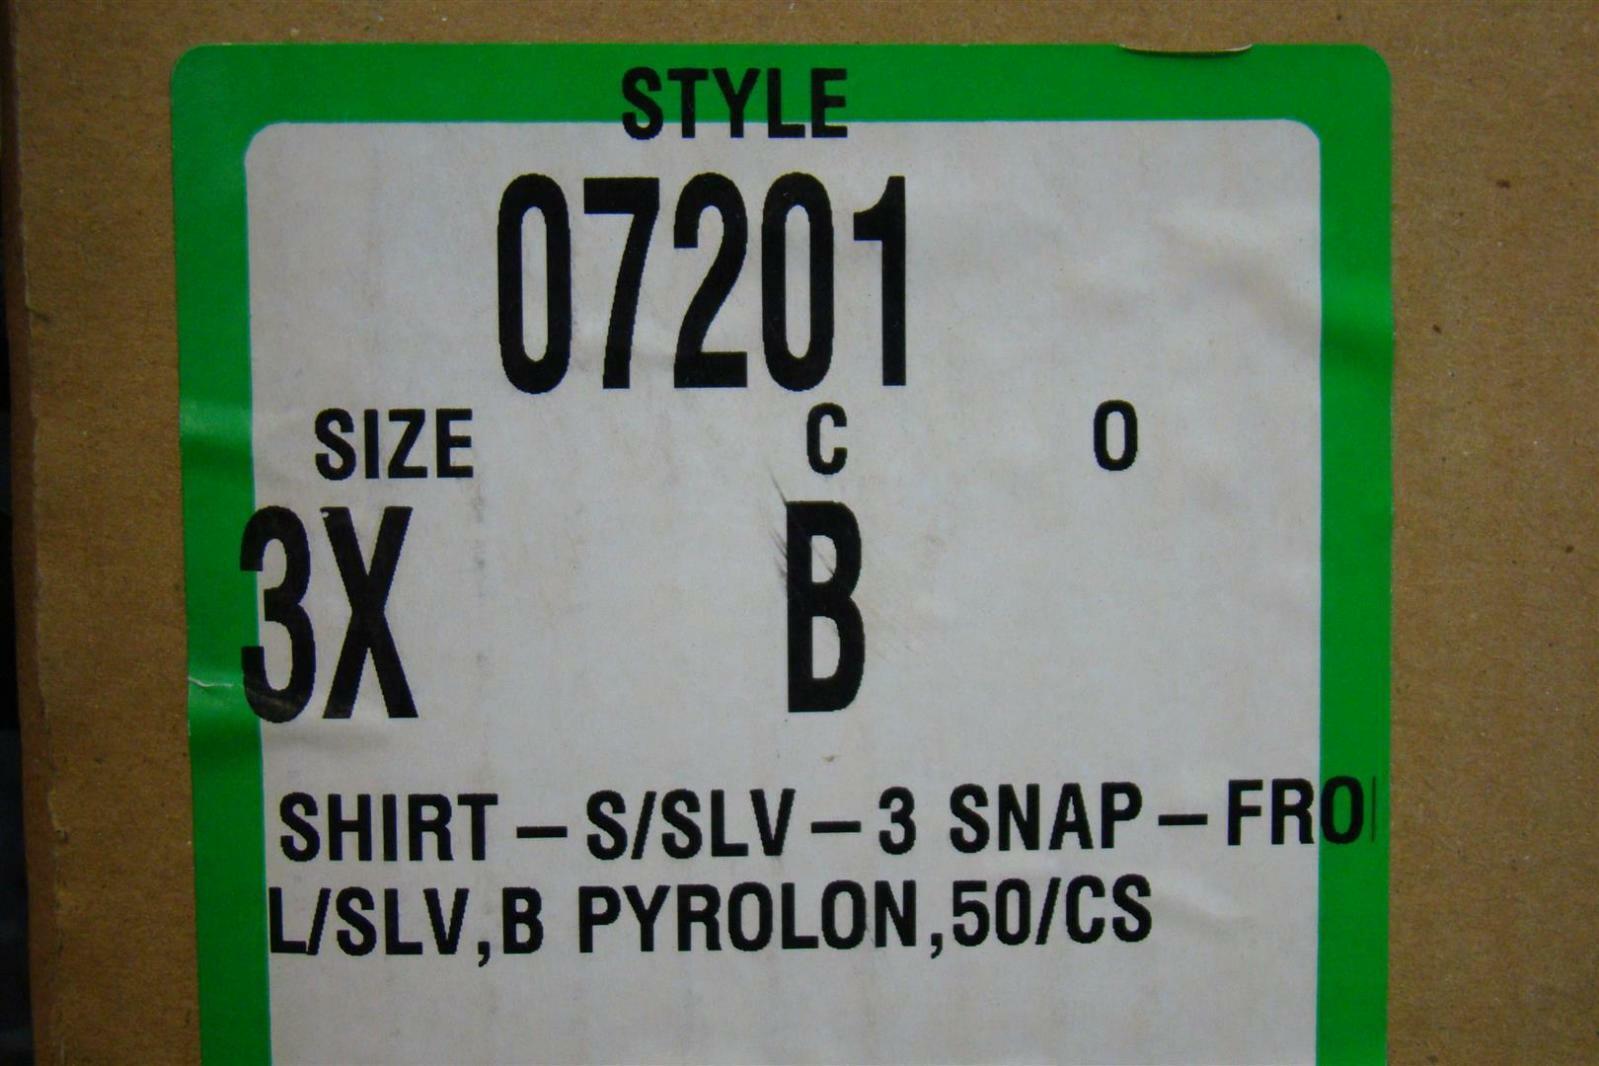 Lakeland Industries 2X Long Sleeves Shirt 07201B 50